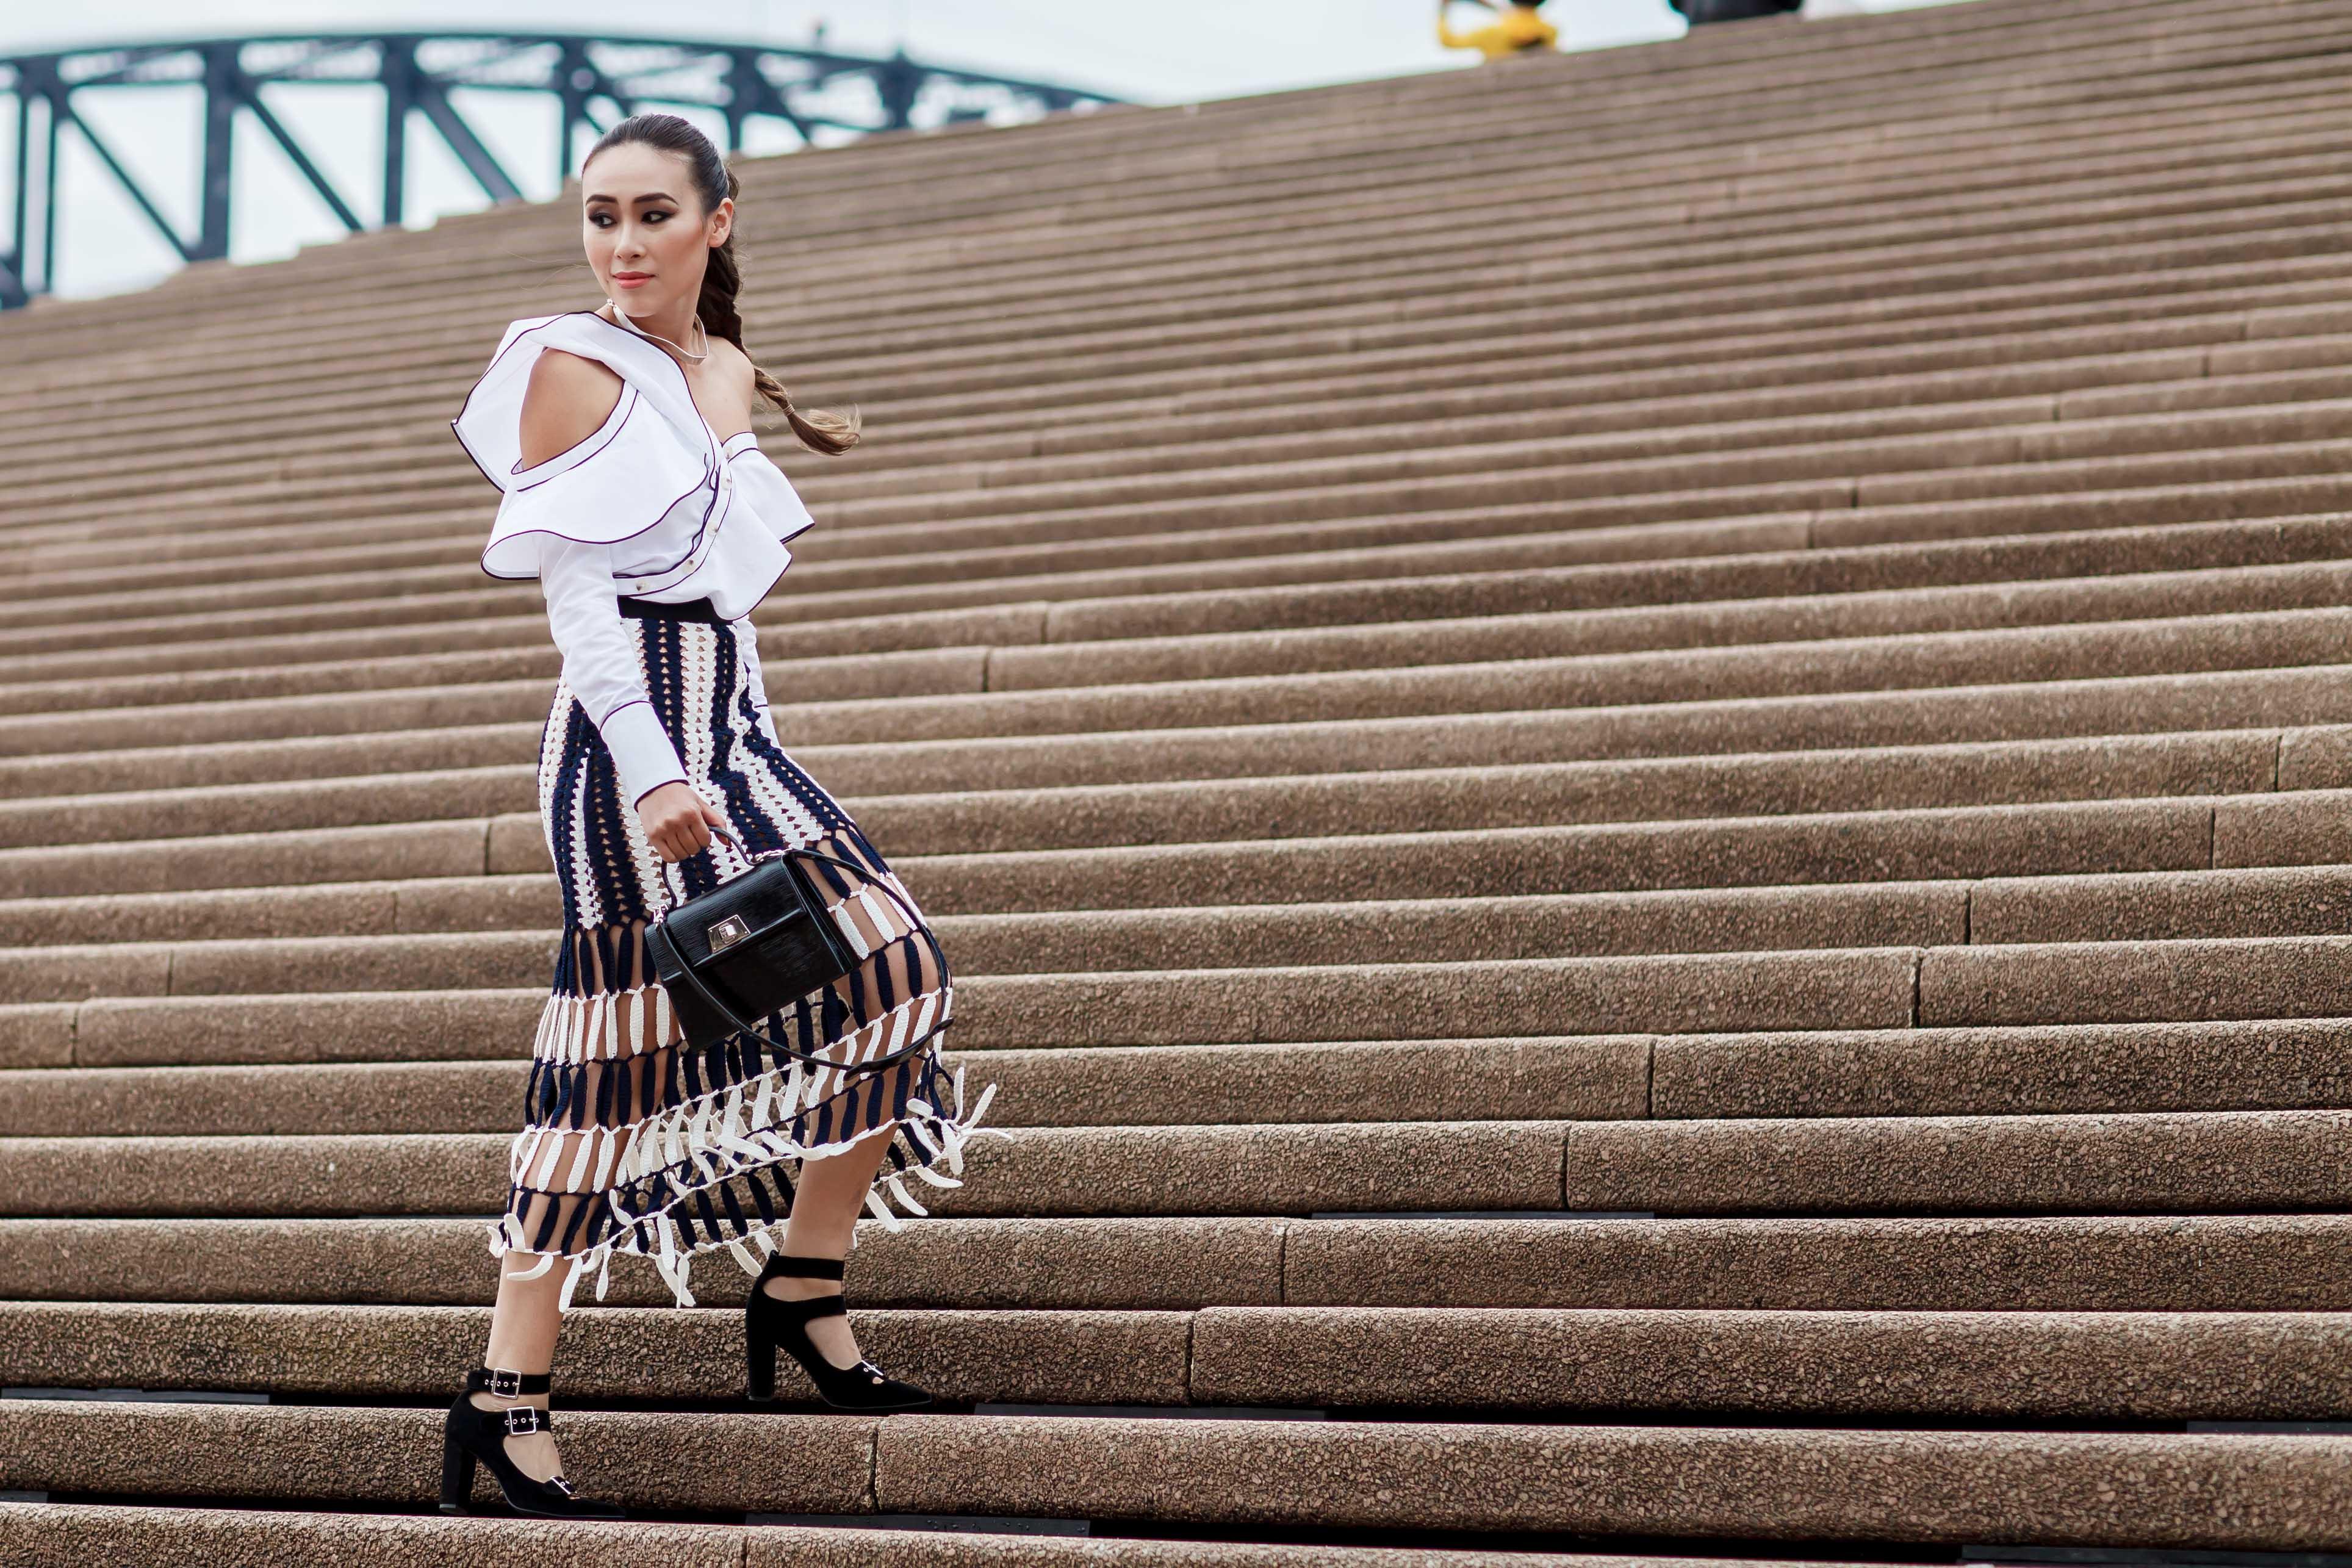 Lynn todd fall runway review, 28 nail fancy art designs